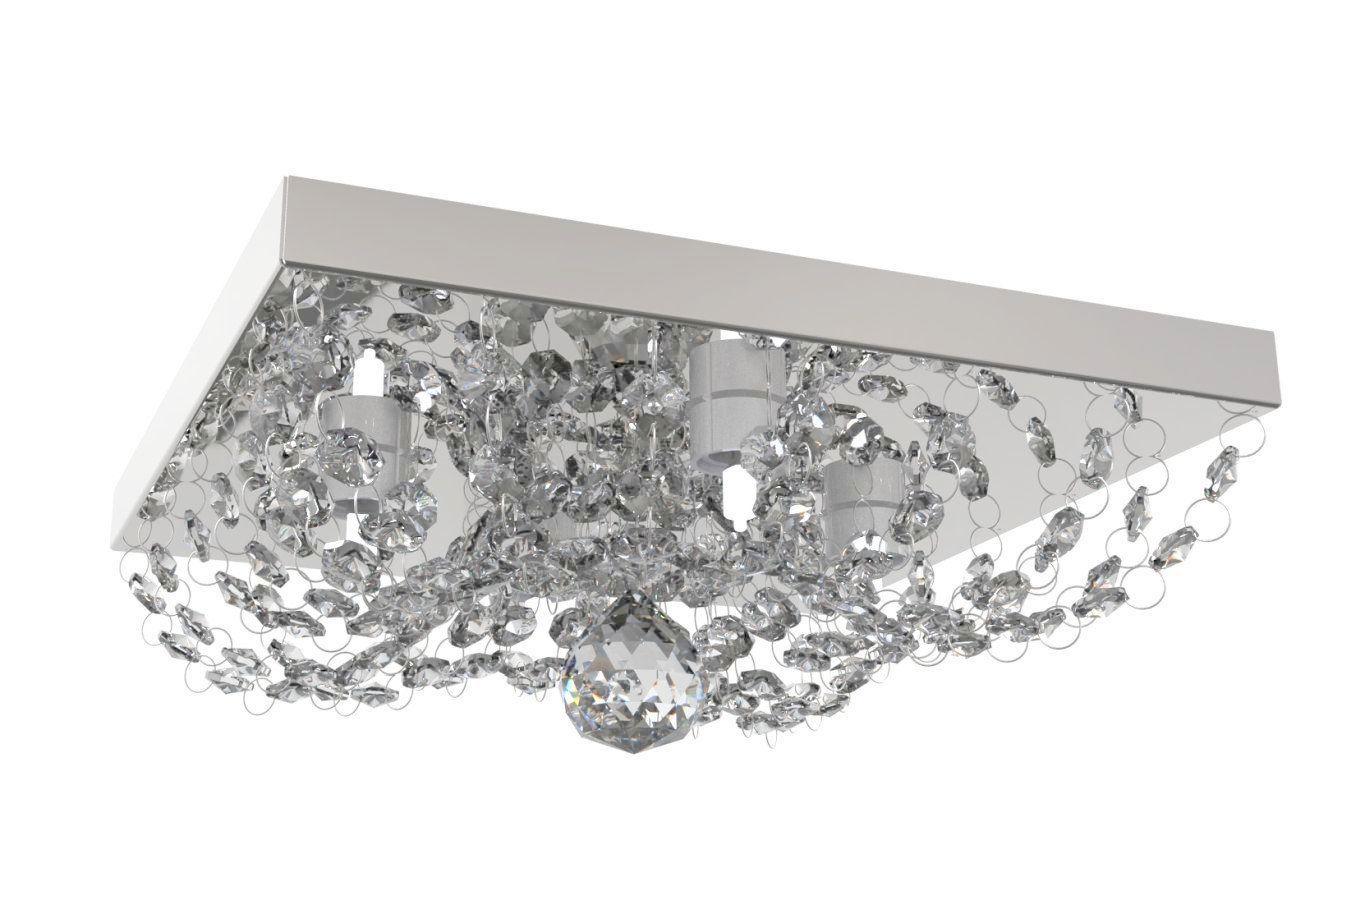 Plafon de Cristal Legitimo Quadrado 25cm Lavabo Corredor Hall Sala C/ Lâmpadas Led